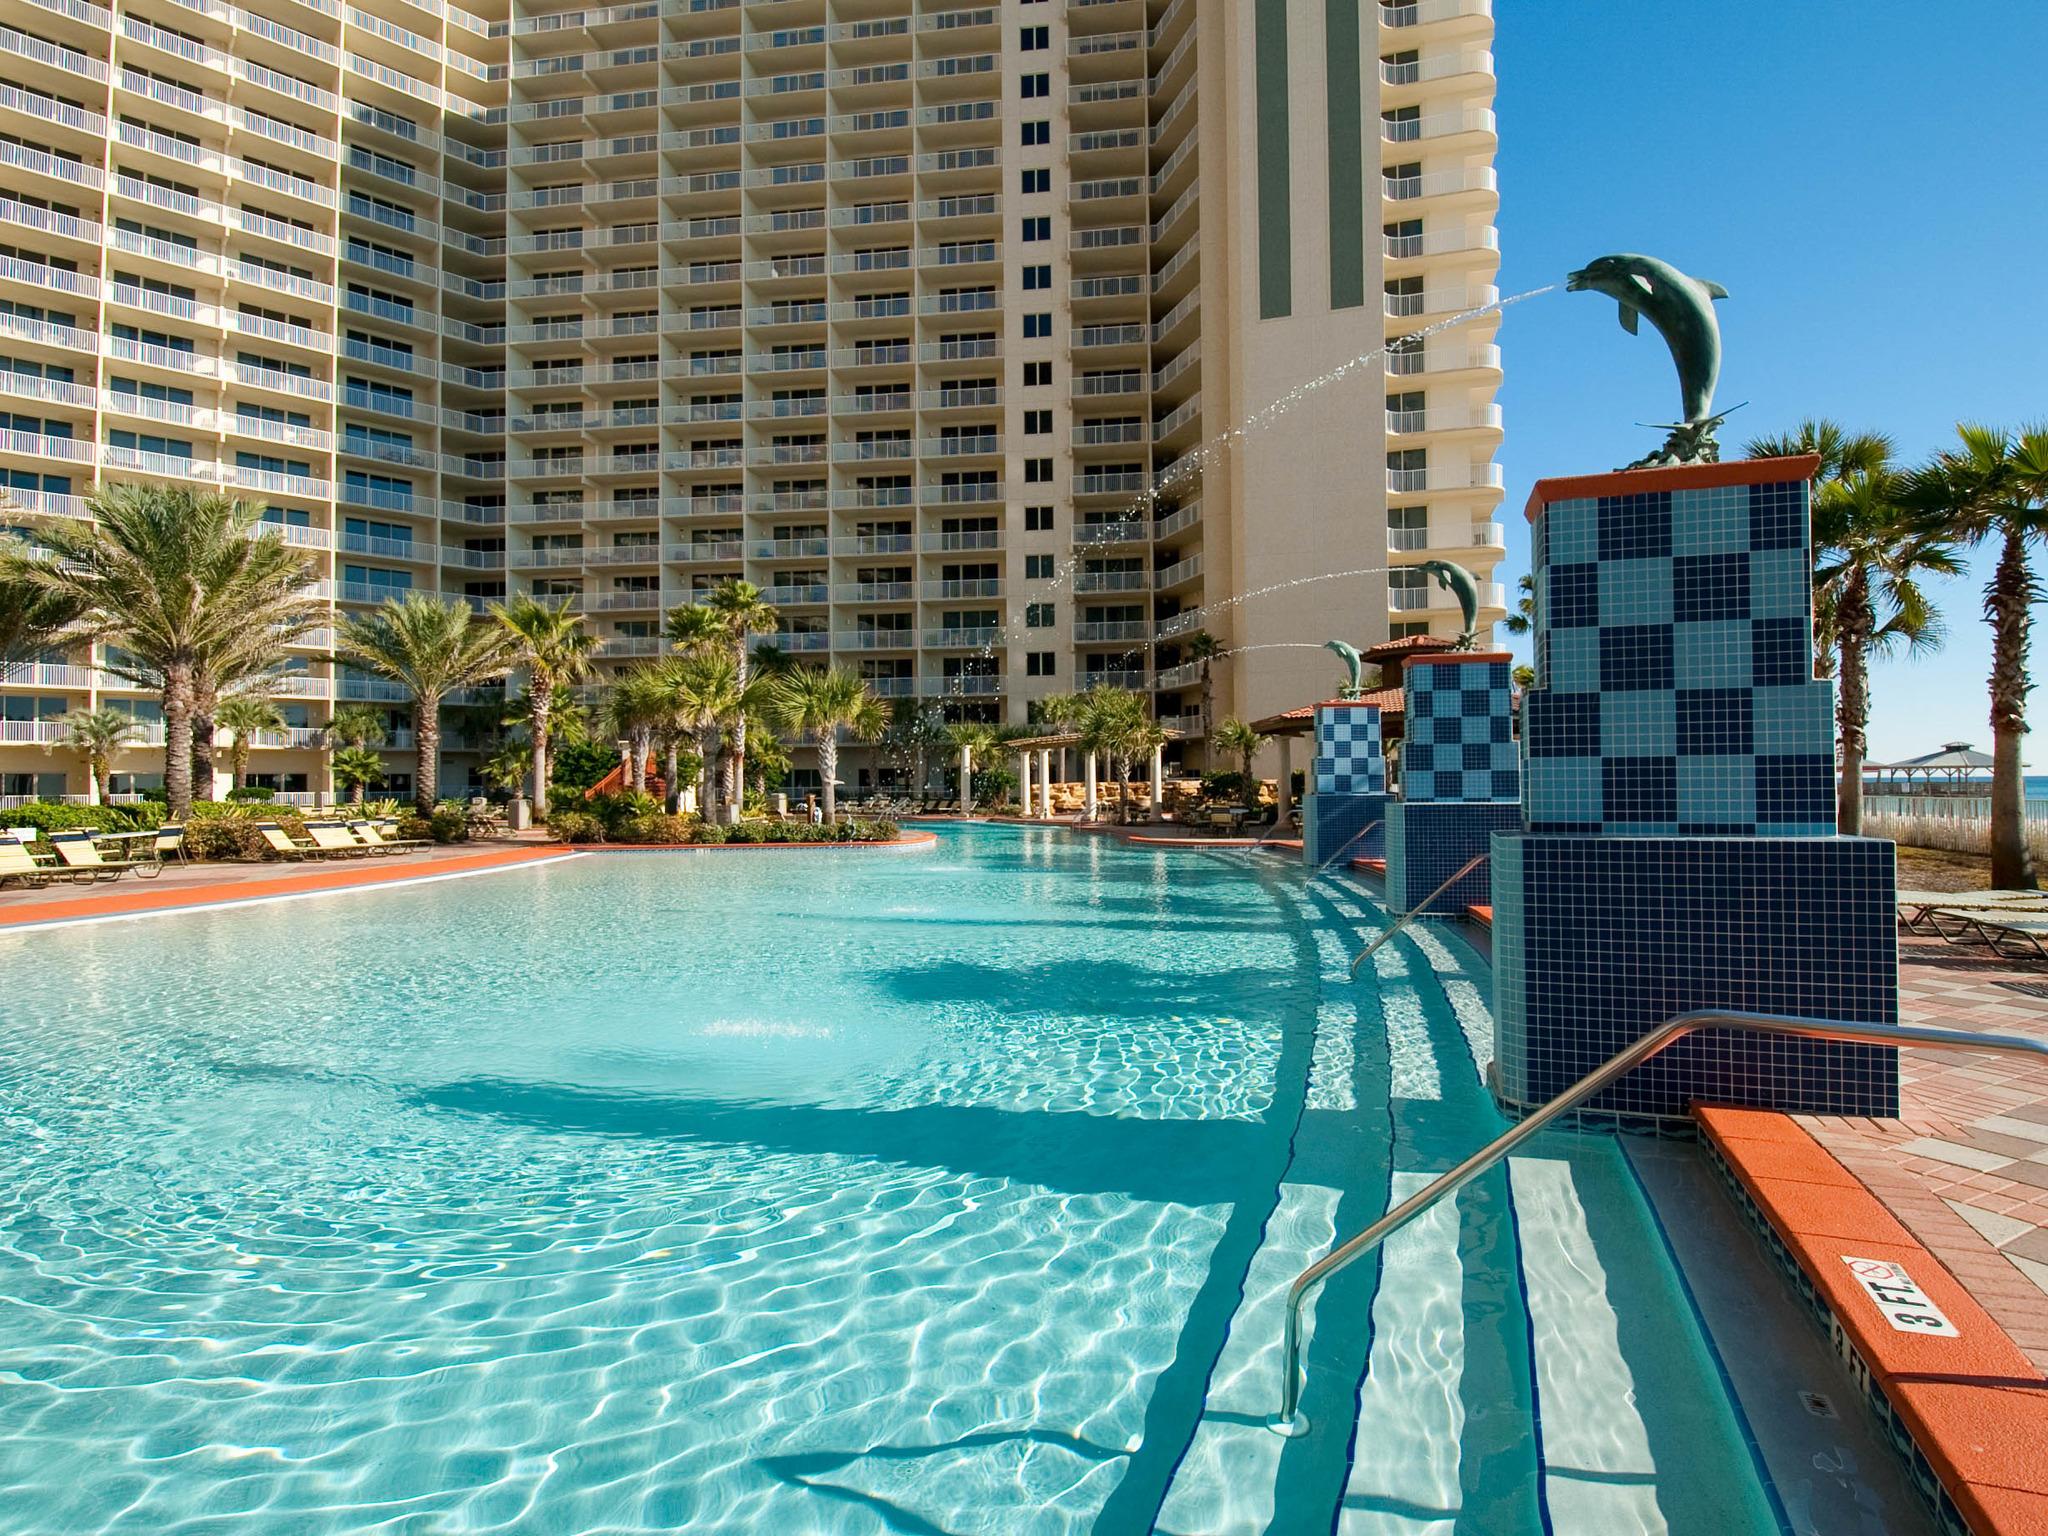 Shores of Panama 2103  Vacation Rentals by Choice Hotels